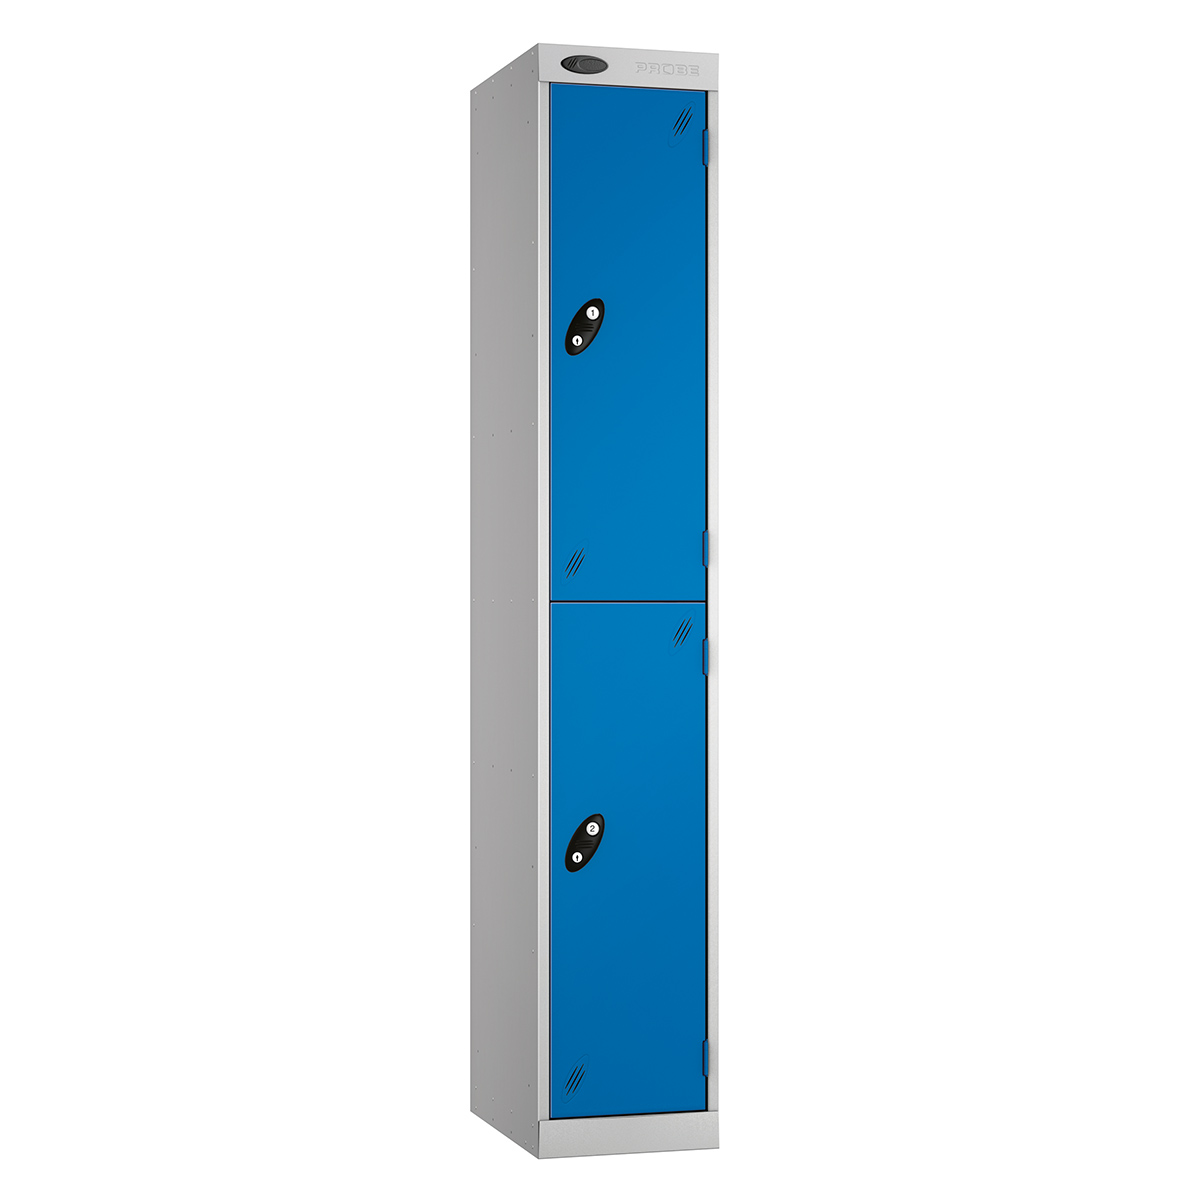 Probe Express Box Lockers - Nest 1 - 2 Tier Lockers